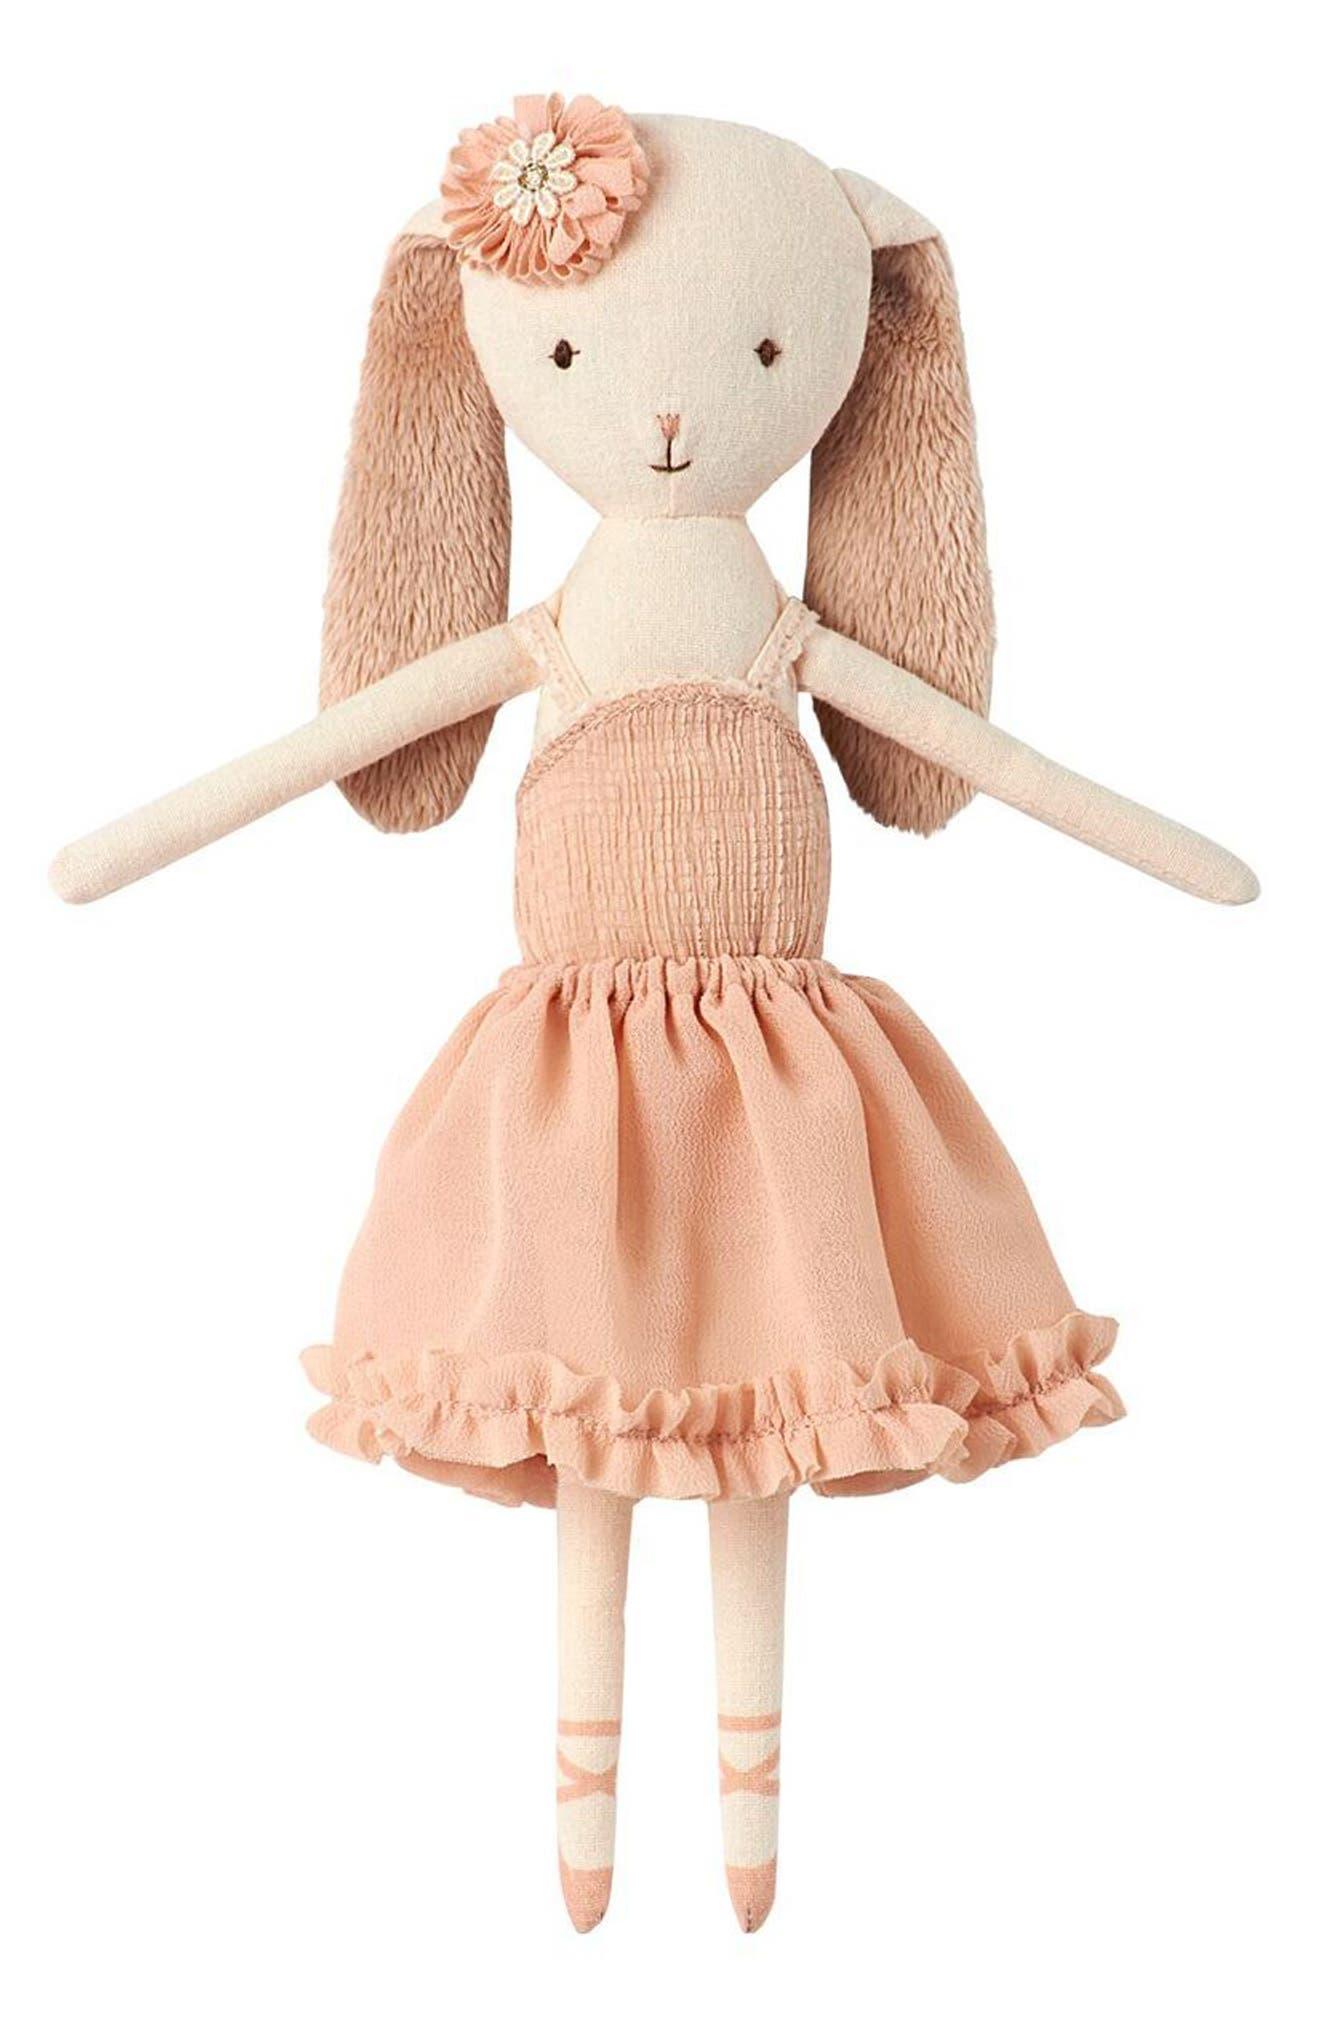 Alternate Image 1 Selected - Maileg Dancing Bunny Stuffed Animal